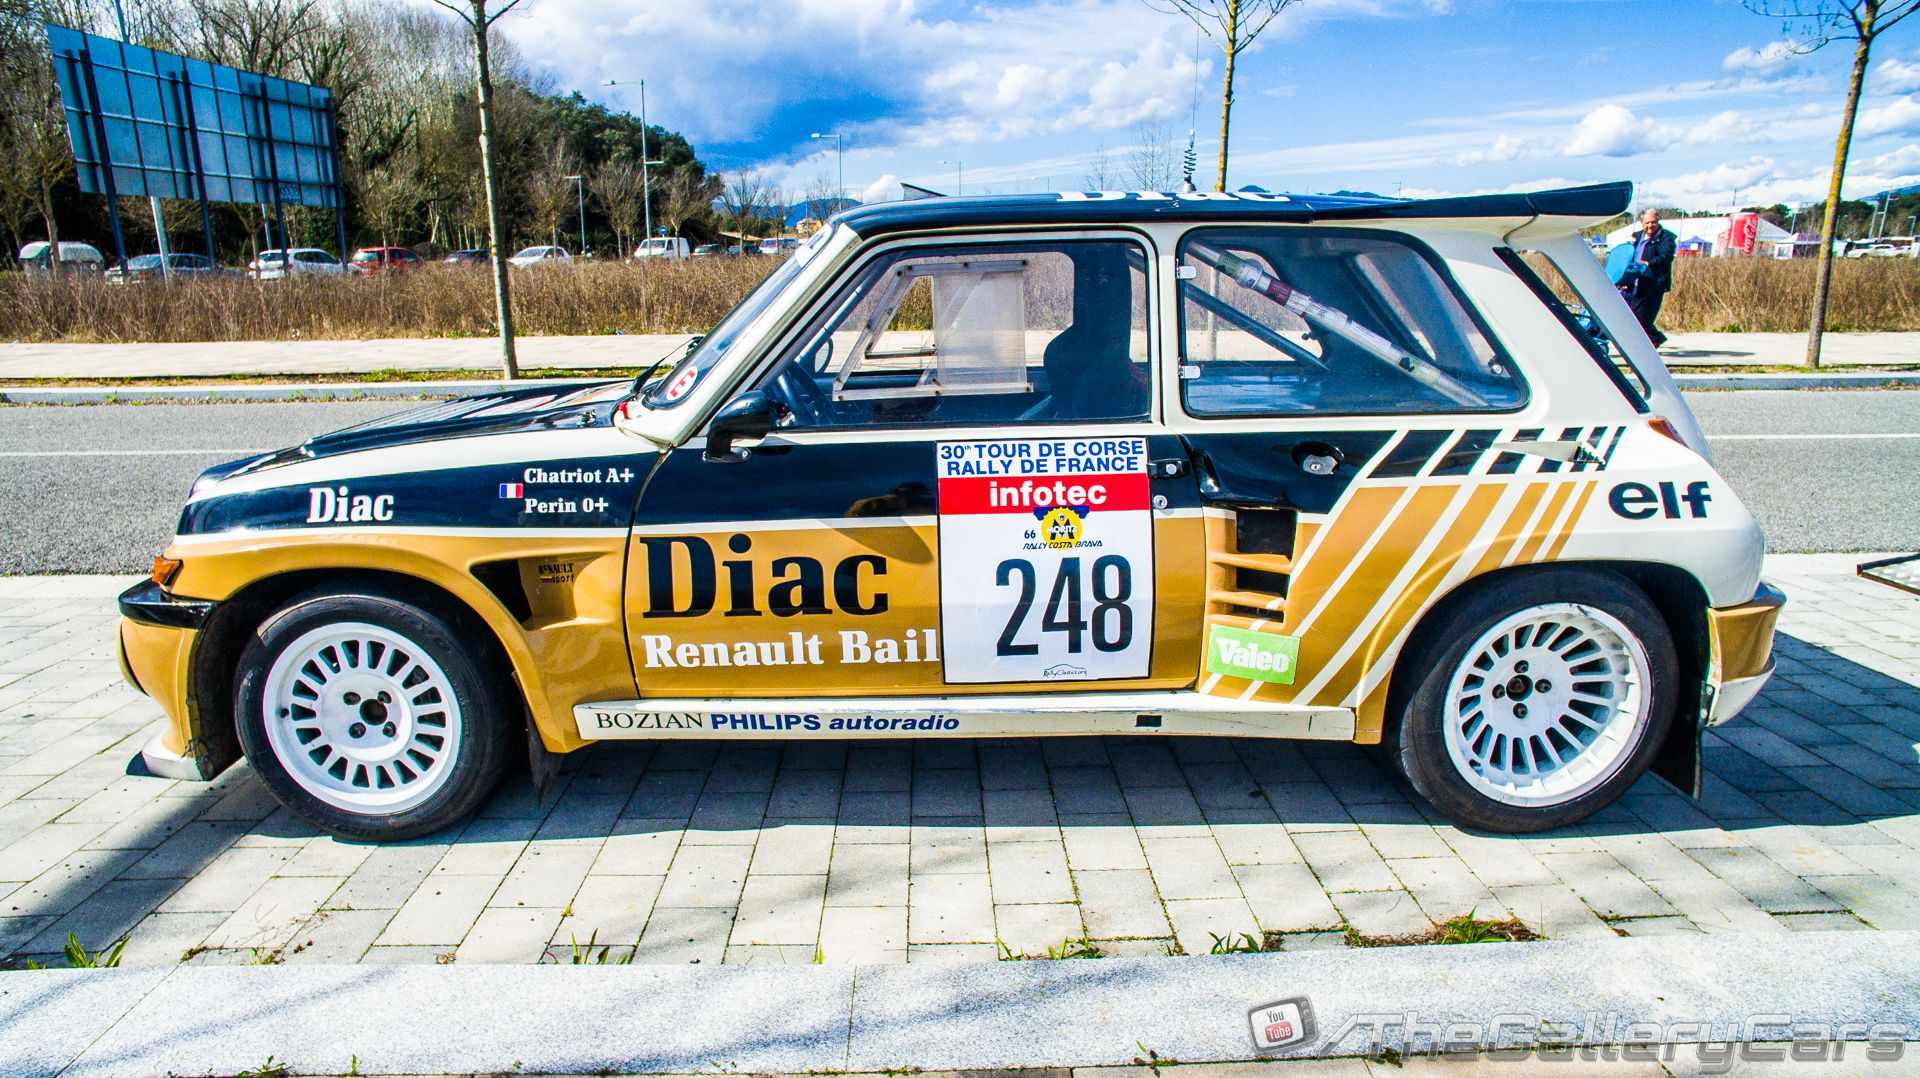 1985 renault 5 maxi turbo diac tour de corse group b rally car of neil brighton and peter. Black Bedroom Furniture Sets. Home Design Ideas